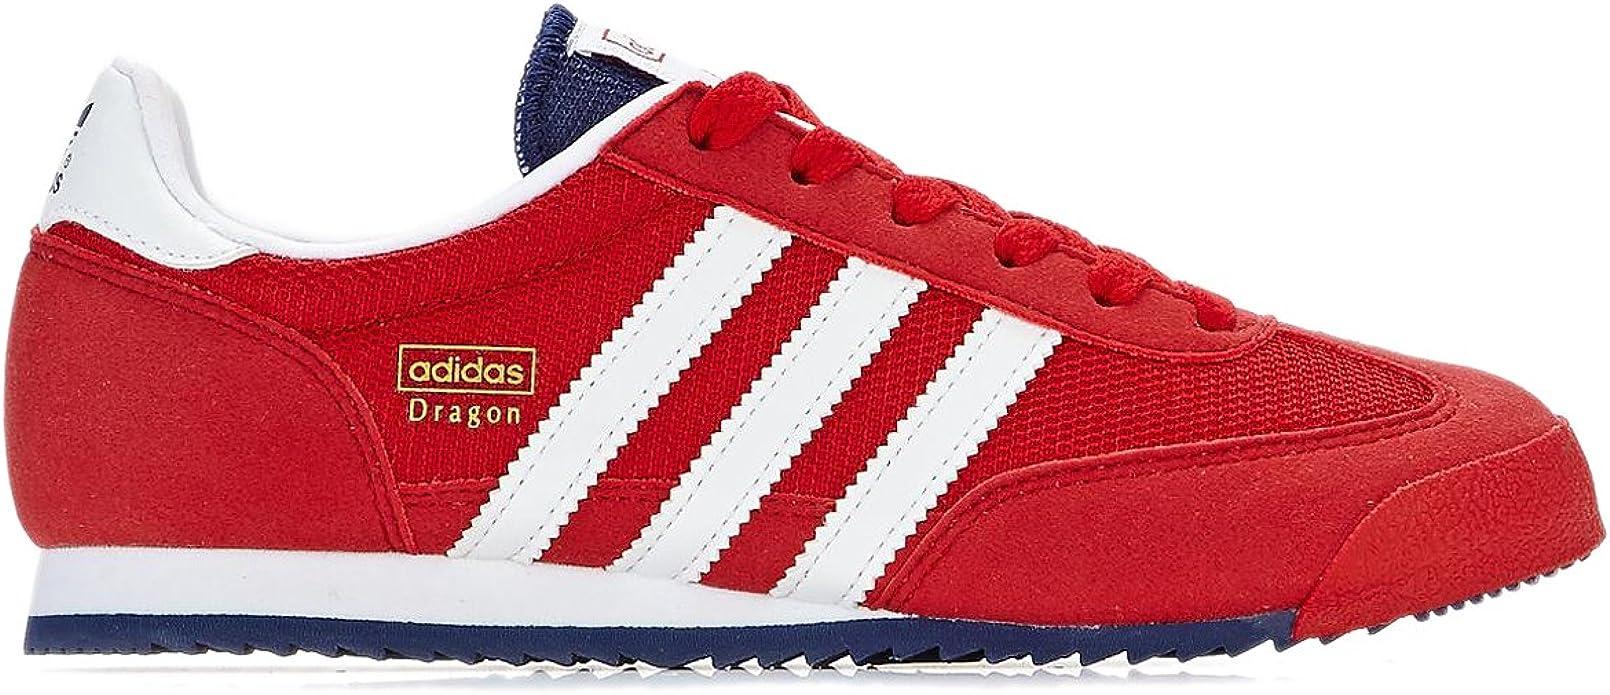 Pero musical Partido  Adidas Dragon J Red White Youths Trainers Size 37 1/3 EU: Amazon.de: Schuhe  & Handtaschen